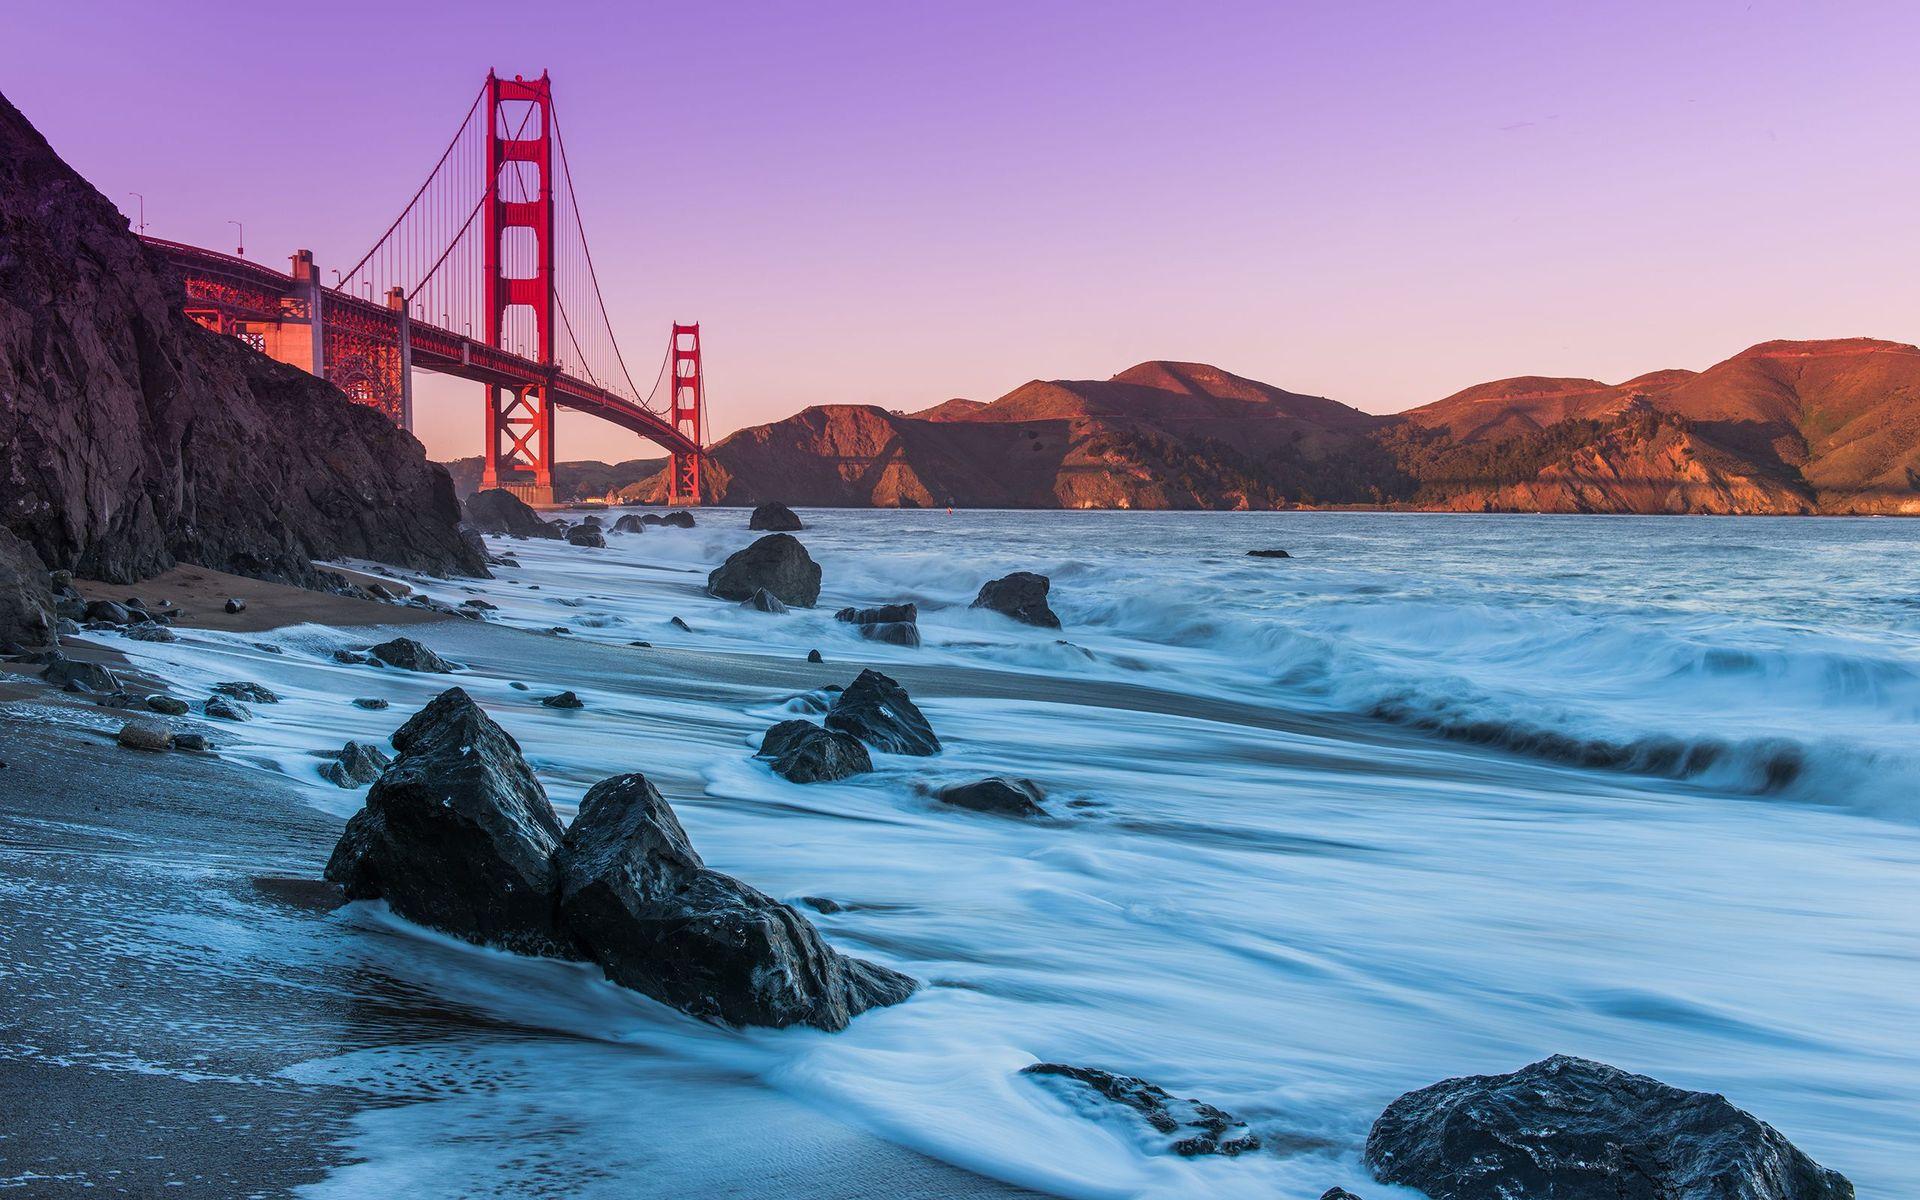 Download Golden Gate Bridge San Francisco wallpaper 1920x1200